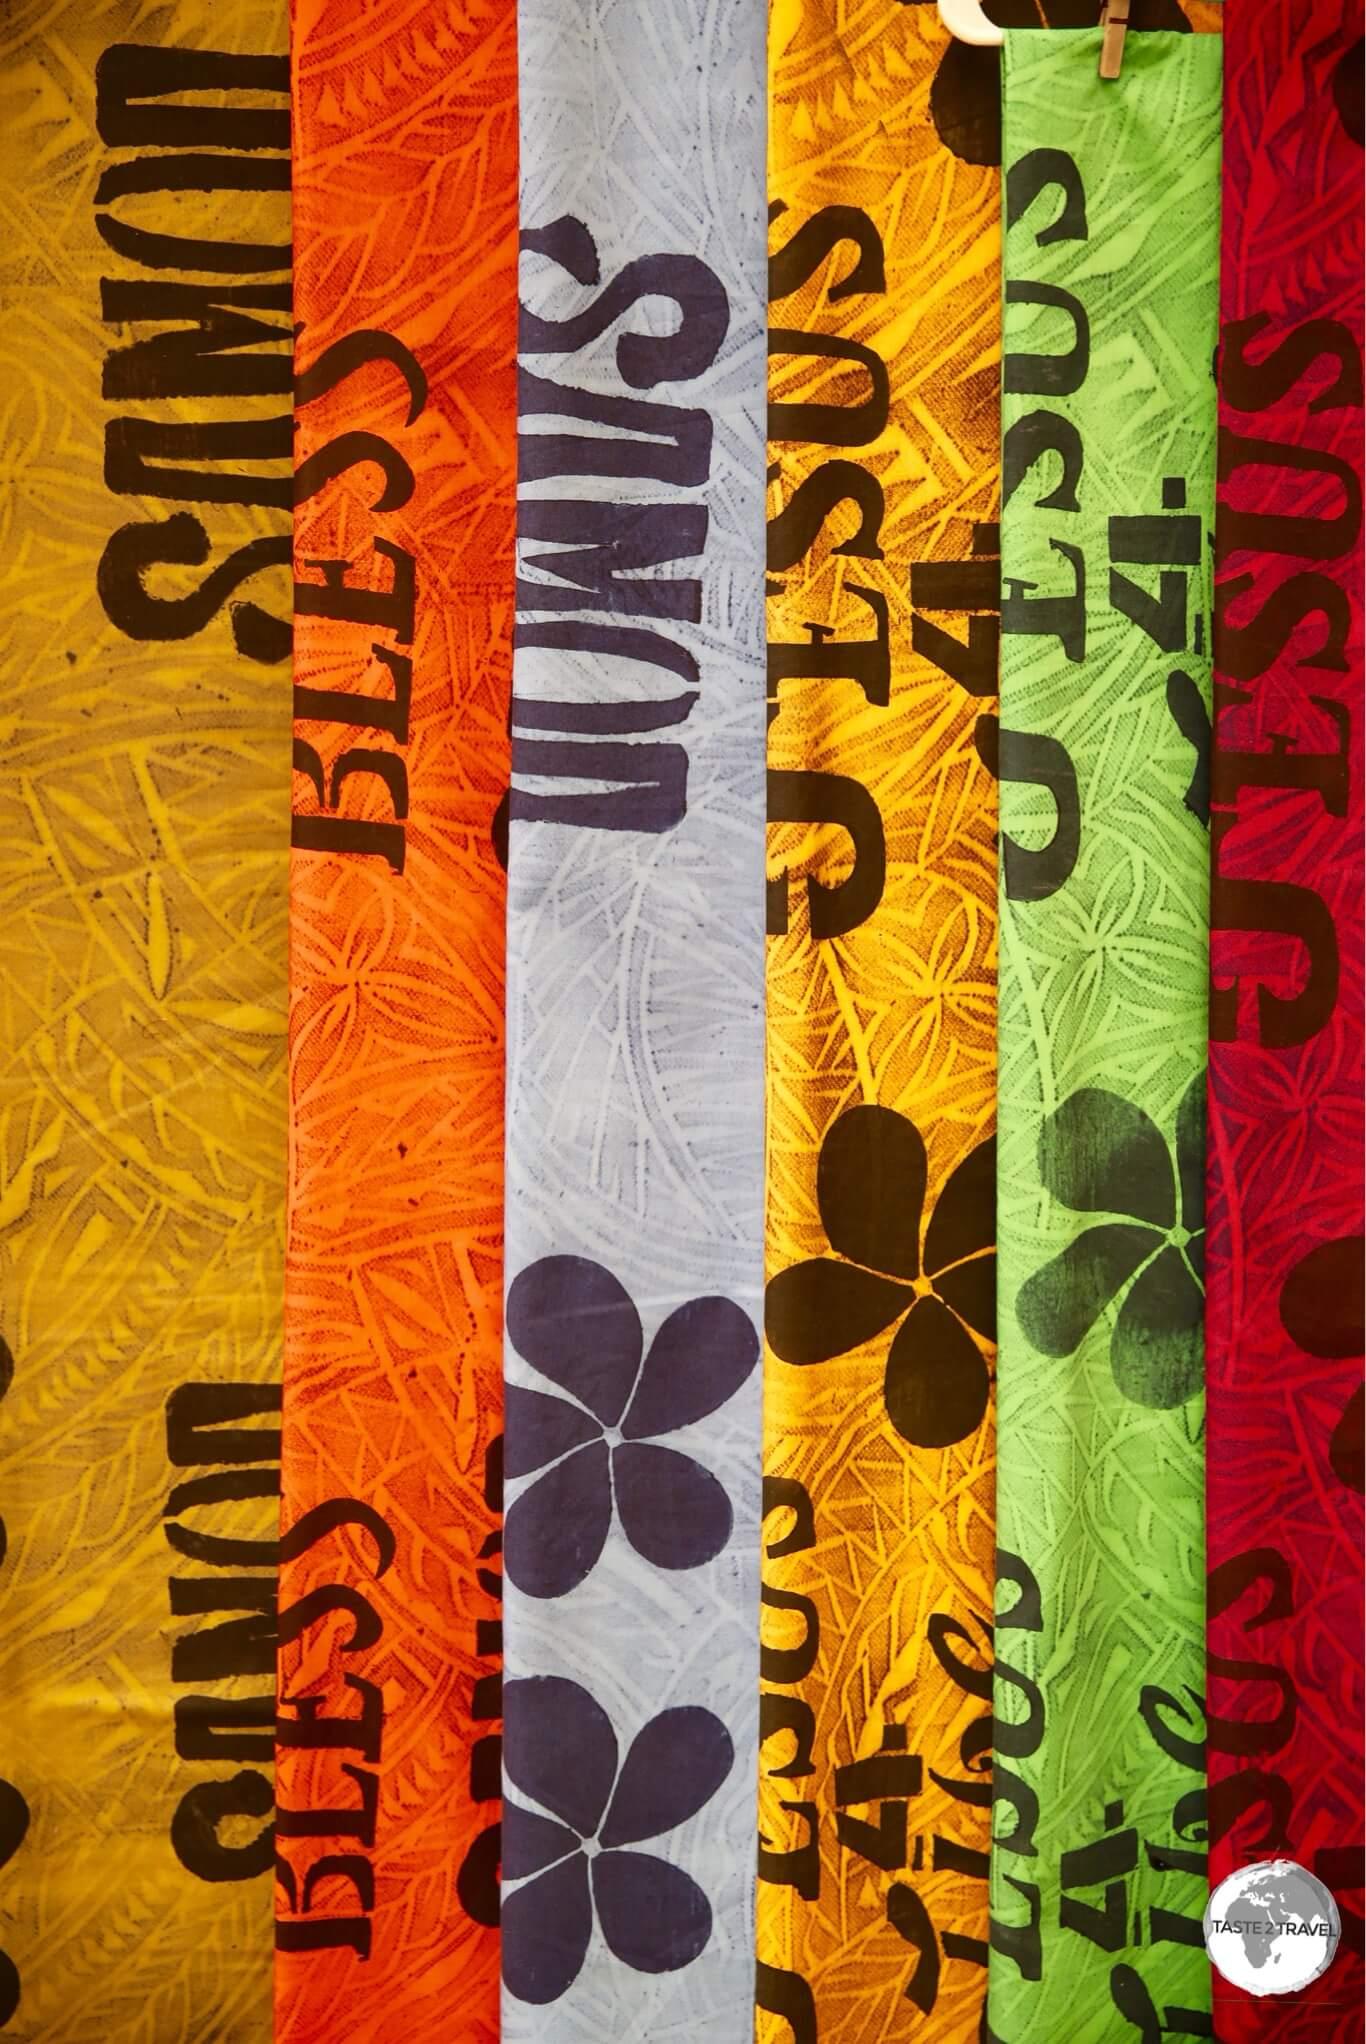 'Samoan' souvenirs on sale at Fagatogomarket in Pago Pago.